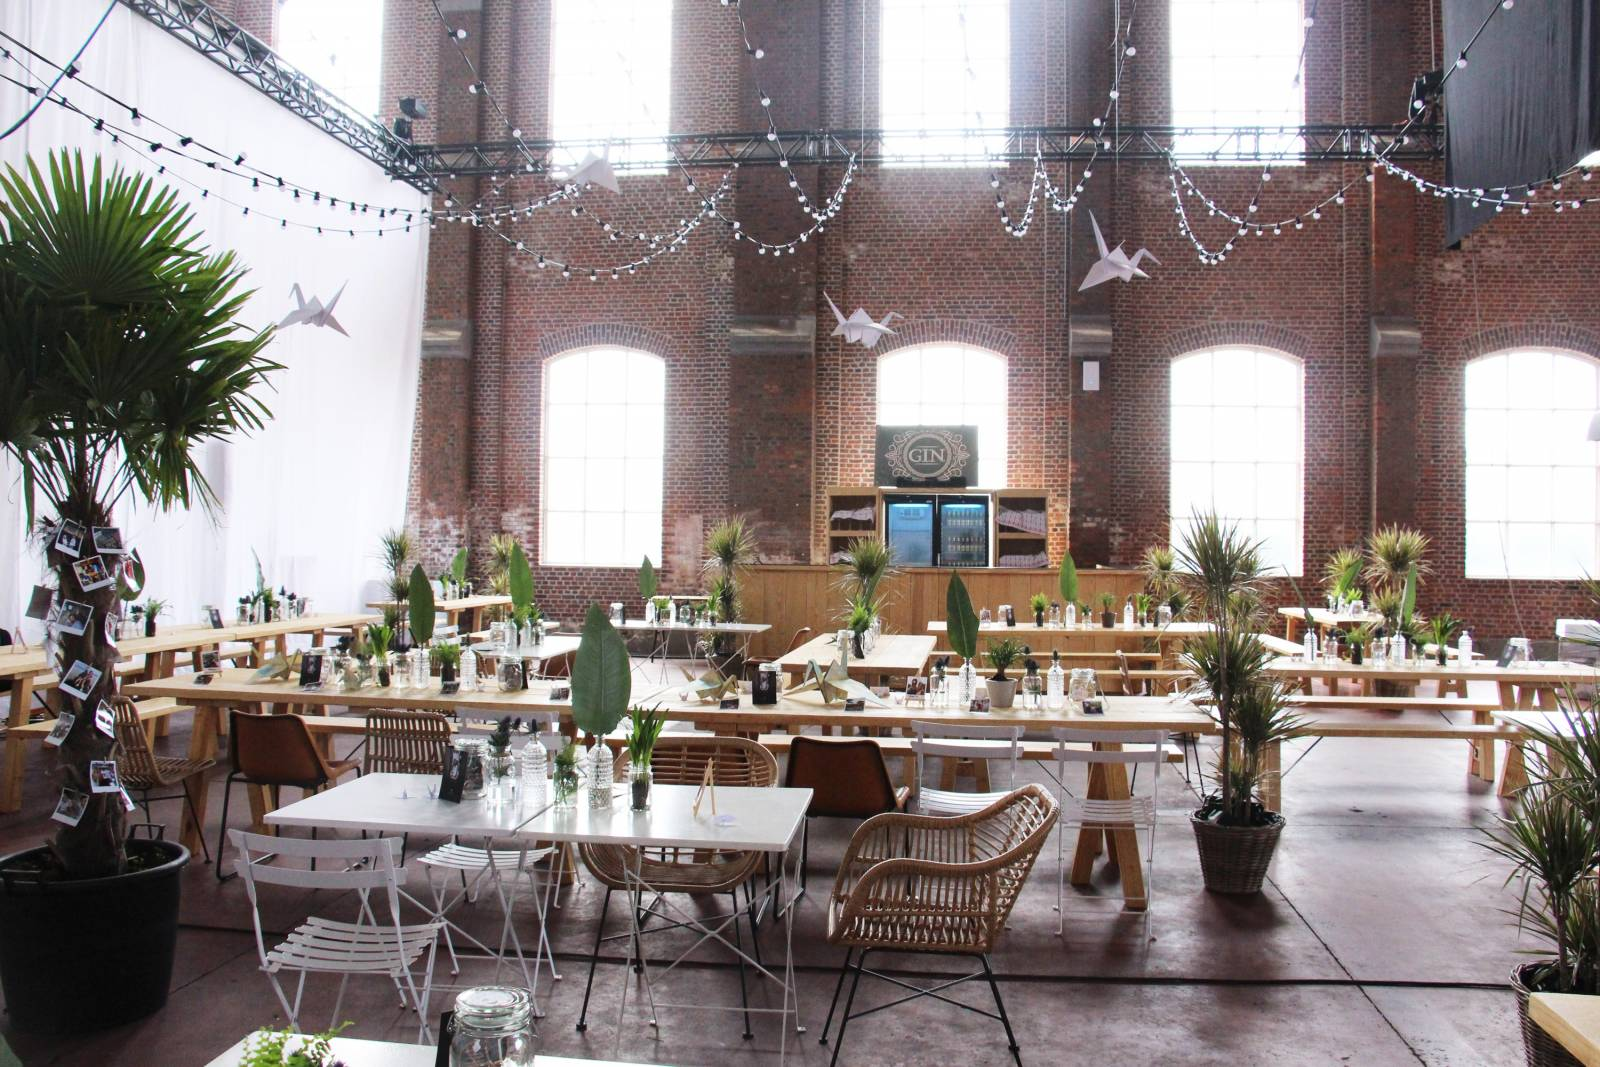 Hangar 43 - Feestzaal Oost-Vlaanderen - Industrieel - House of Weddings - 45